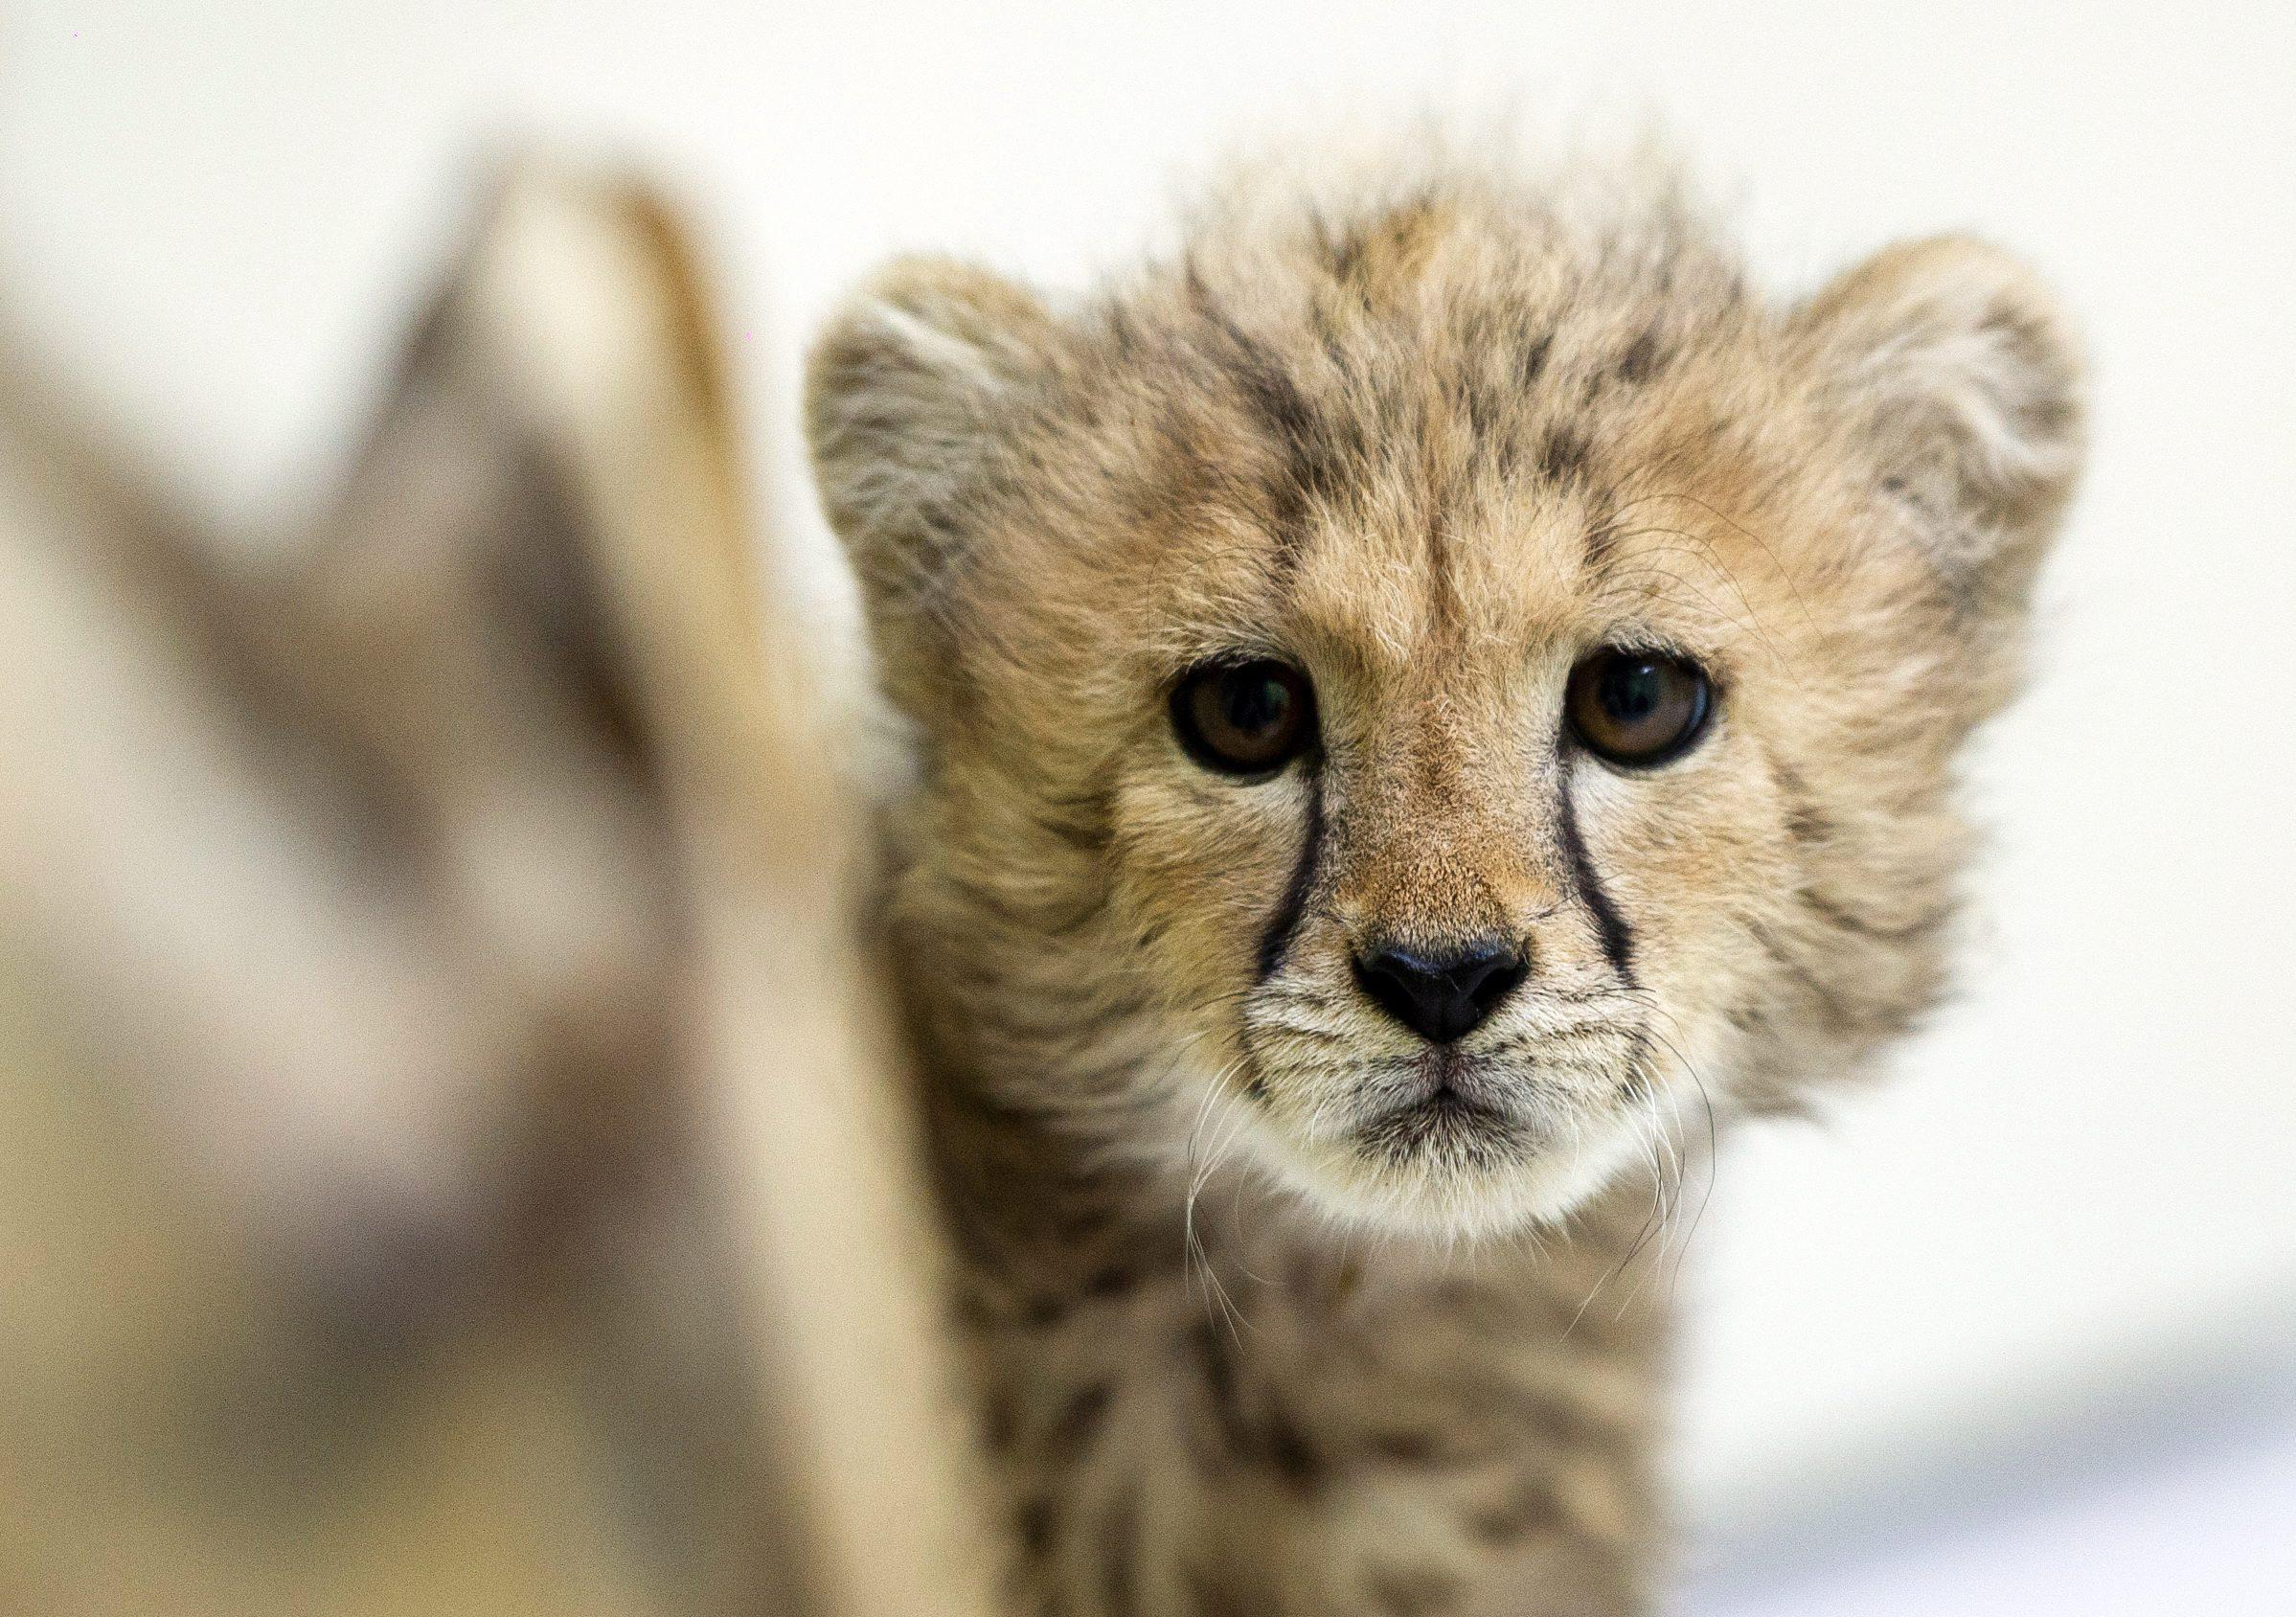 Baby cheetah in Lodz Zoo02